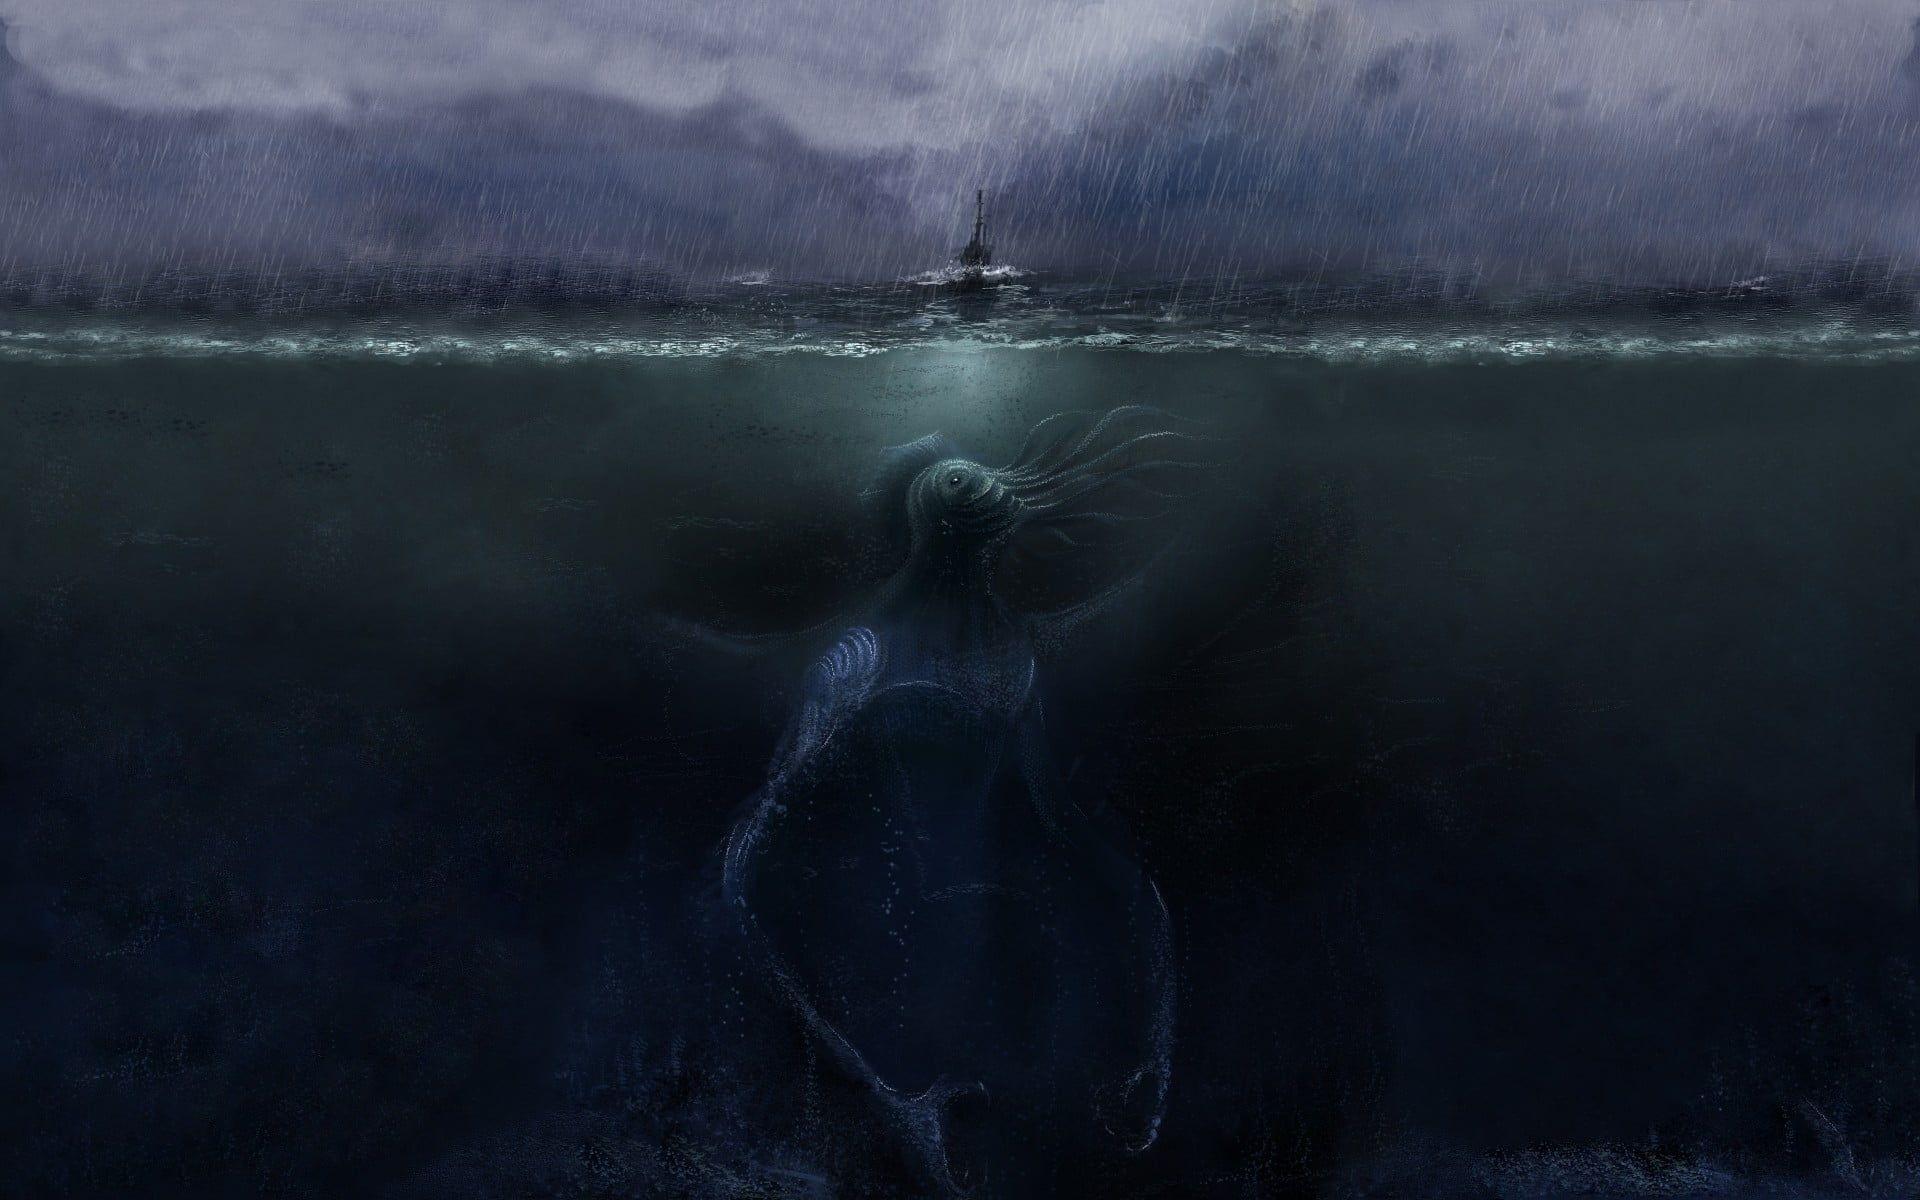 Sea Monster Wallpaper Fantasy Art Sea Sea Monsters Rain Storm Digital Art Split View Cthulhu Creature Un Underwater Painting Sea Monsters Storm Wallpaper